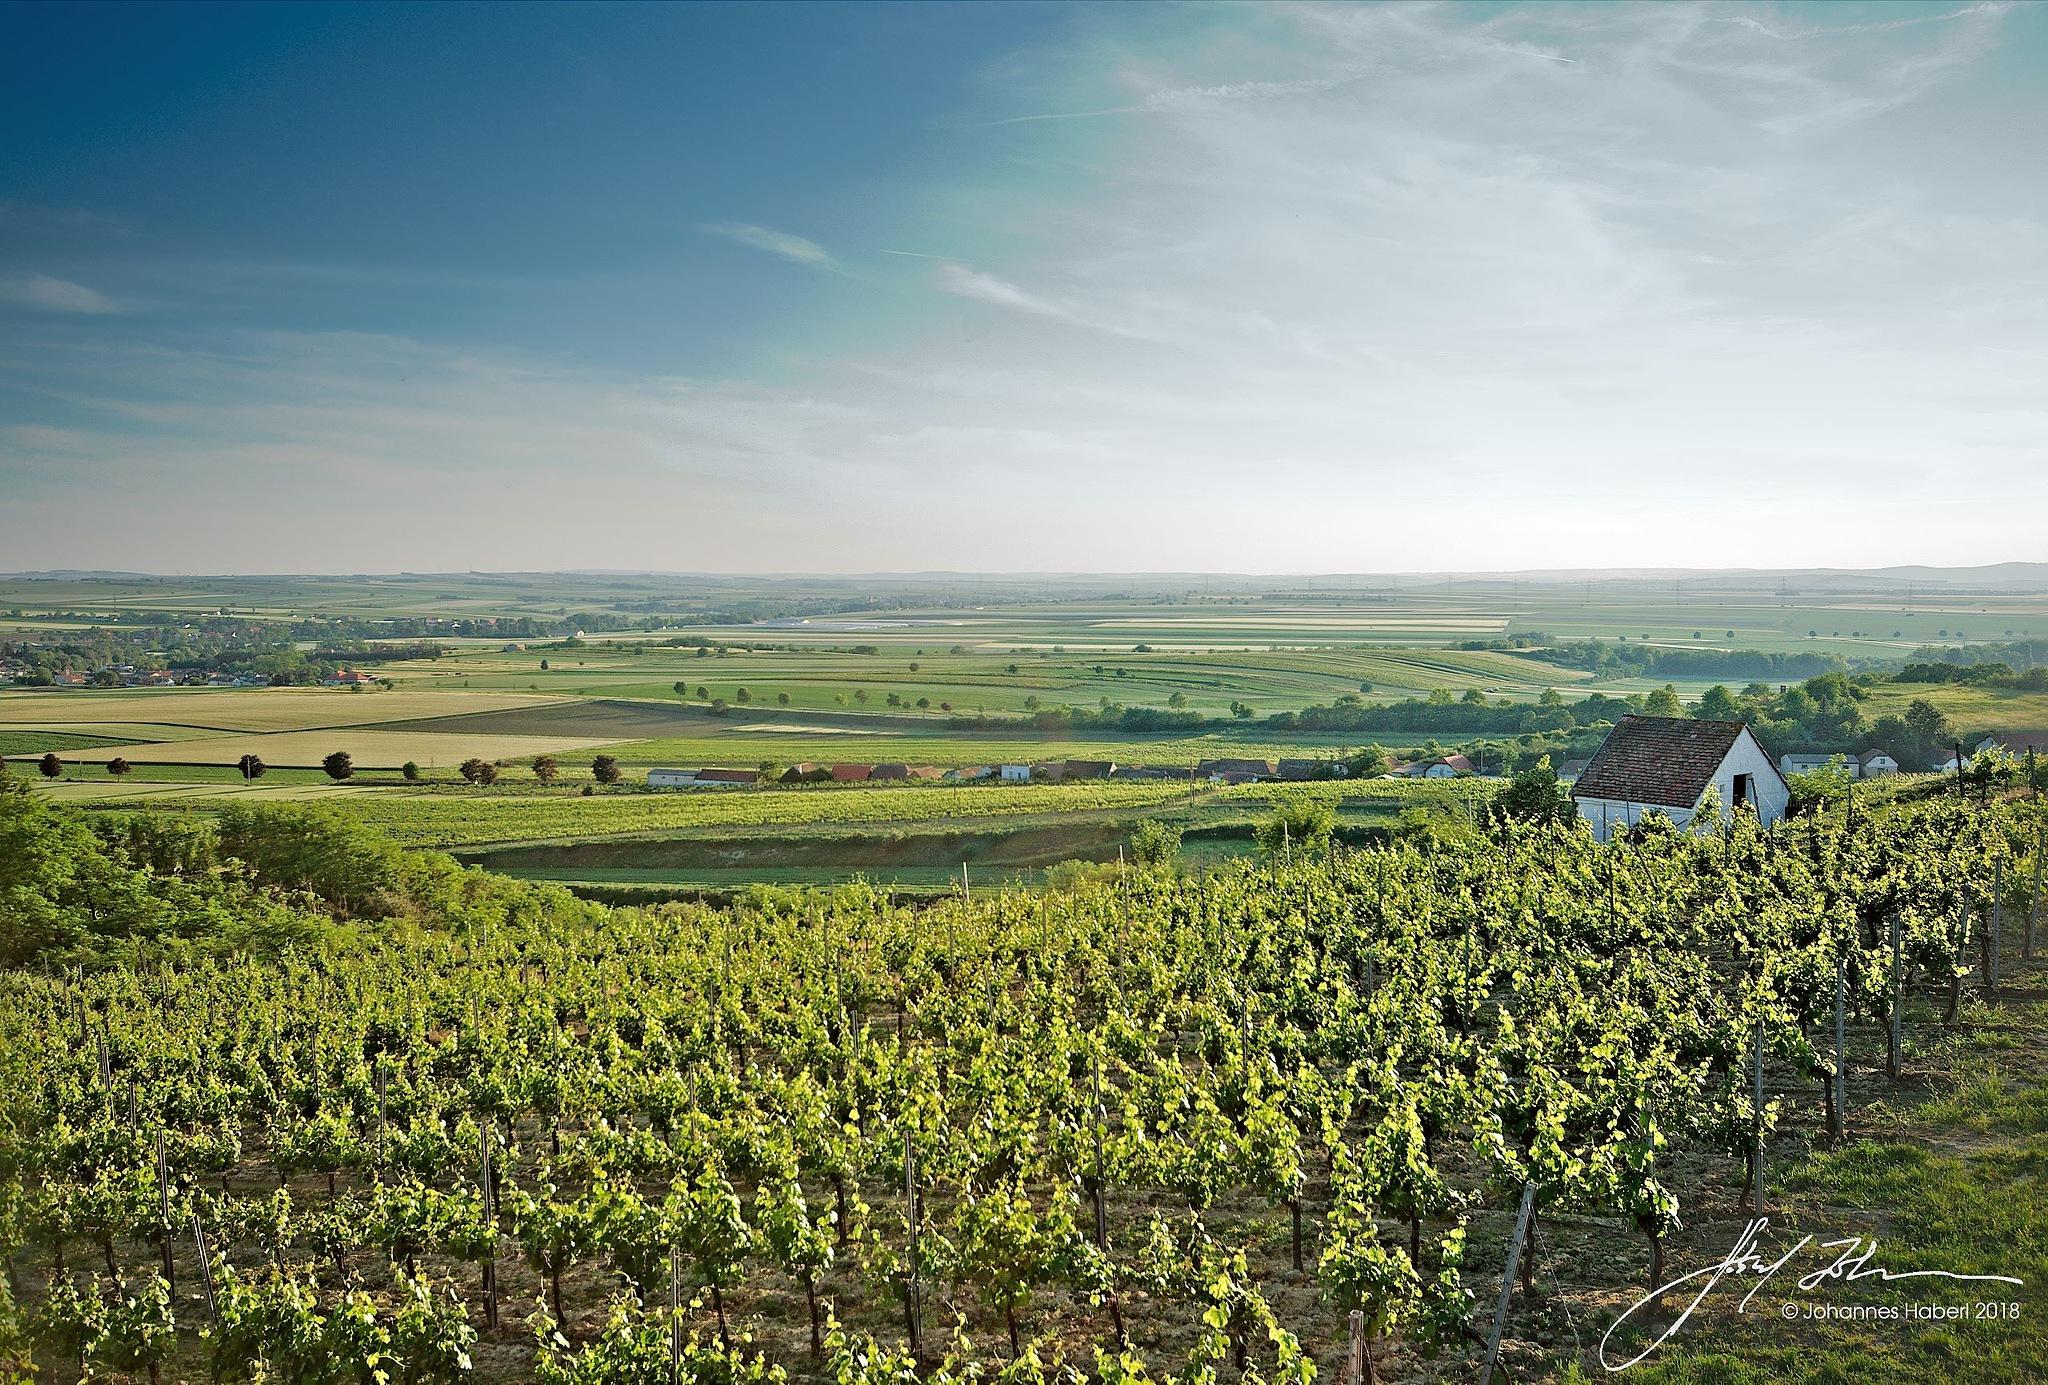 Schatzberg vineyard & cellar-house, view to the plain by Johannes Haberl